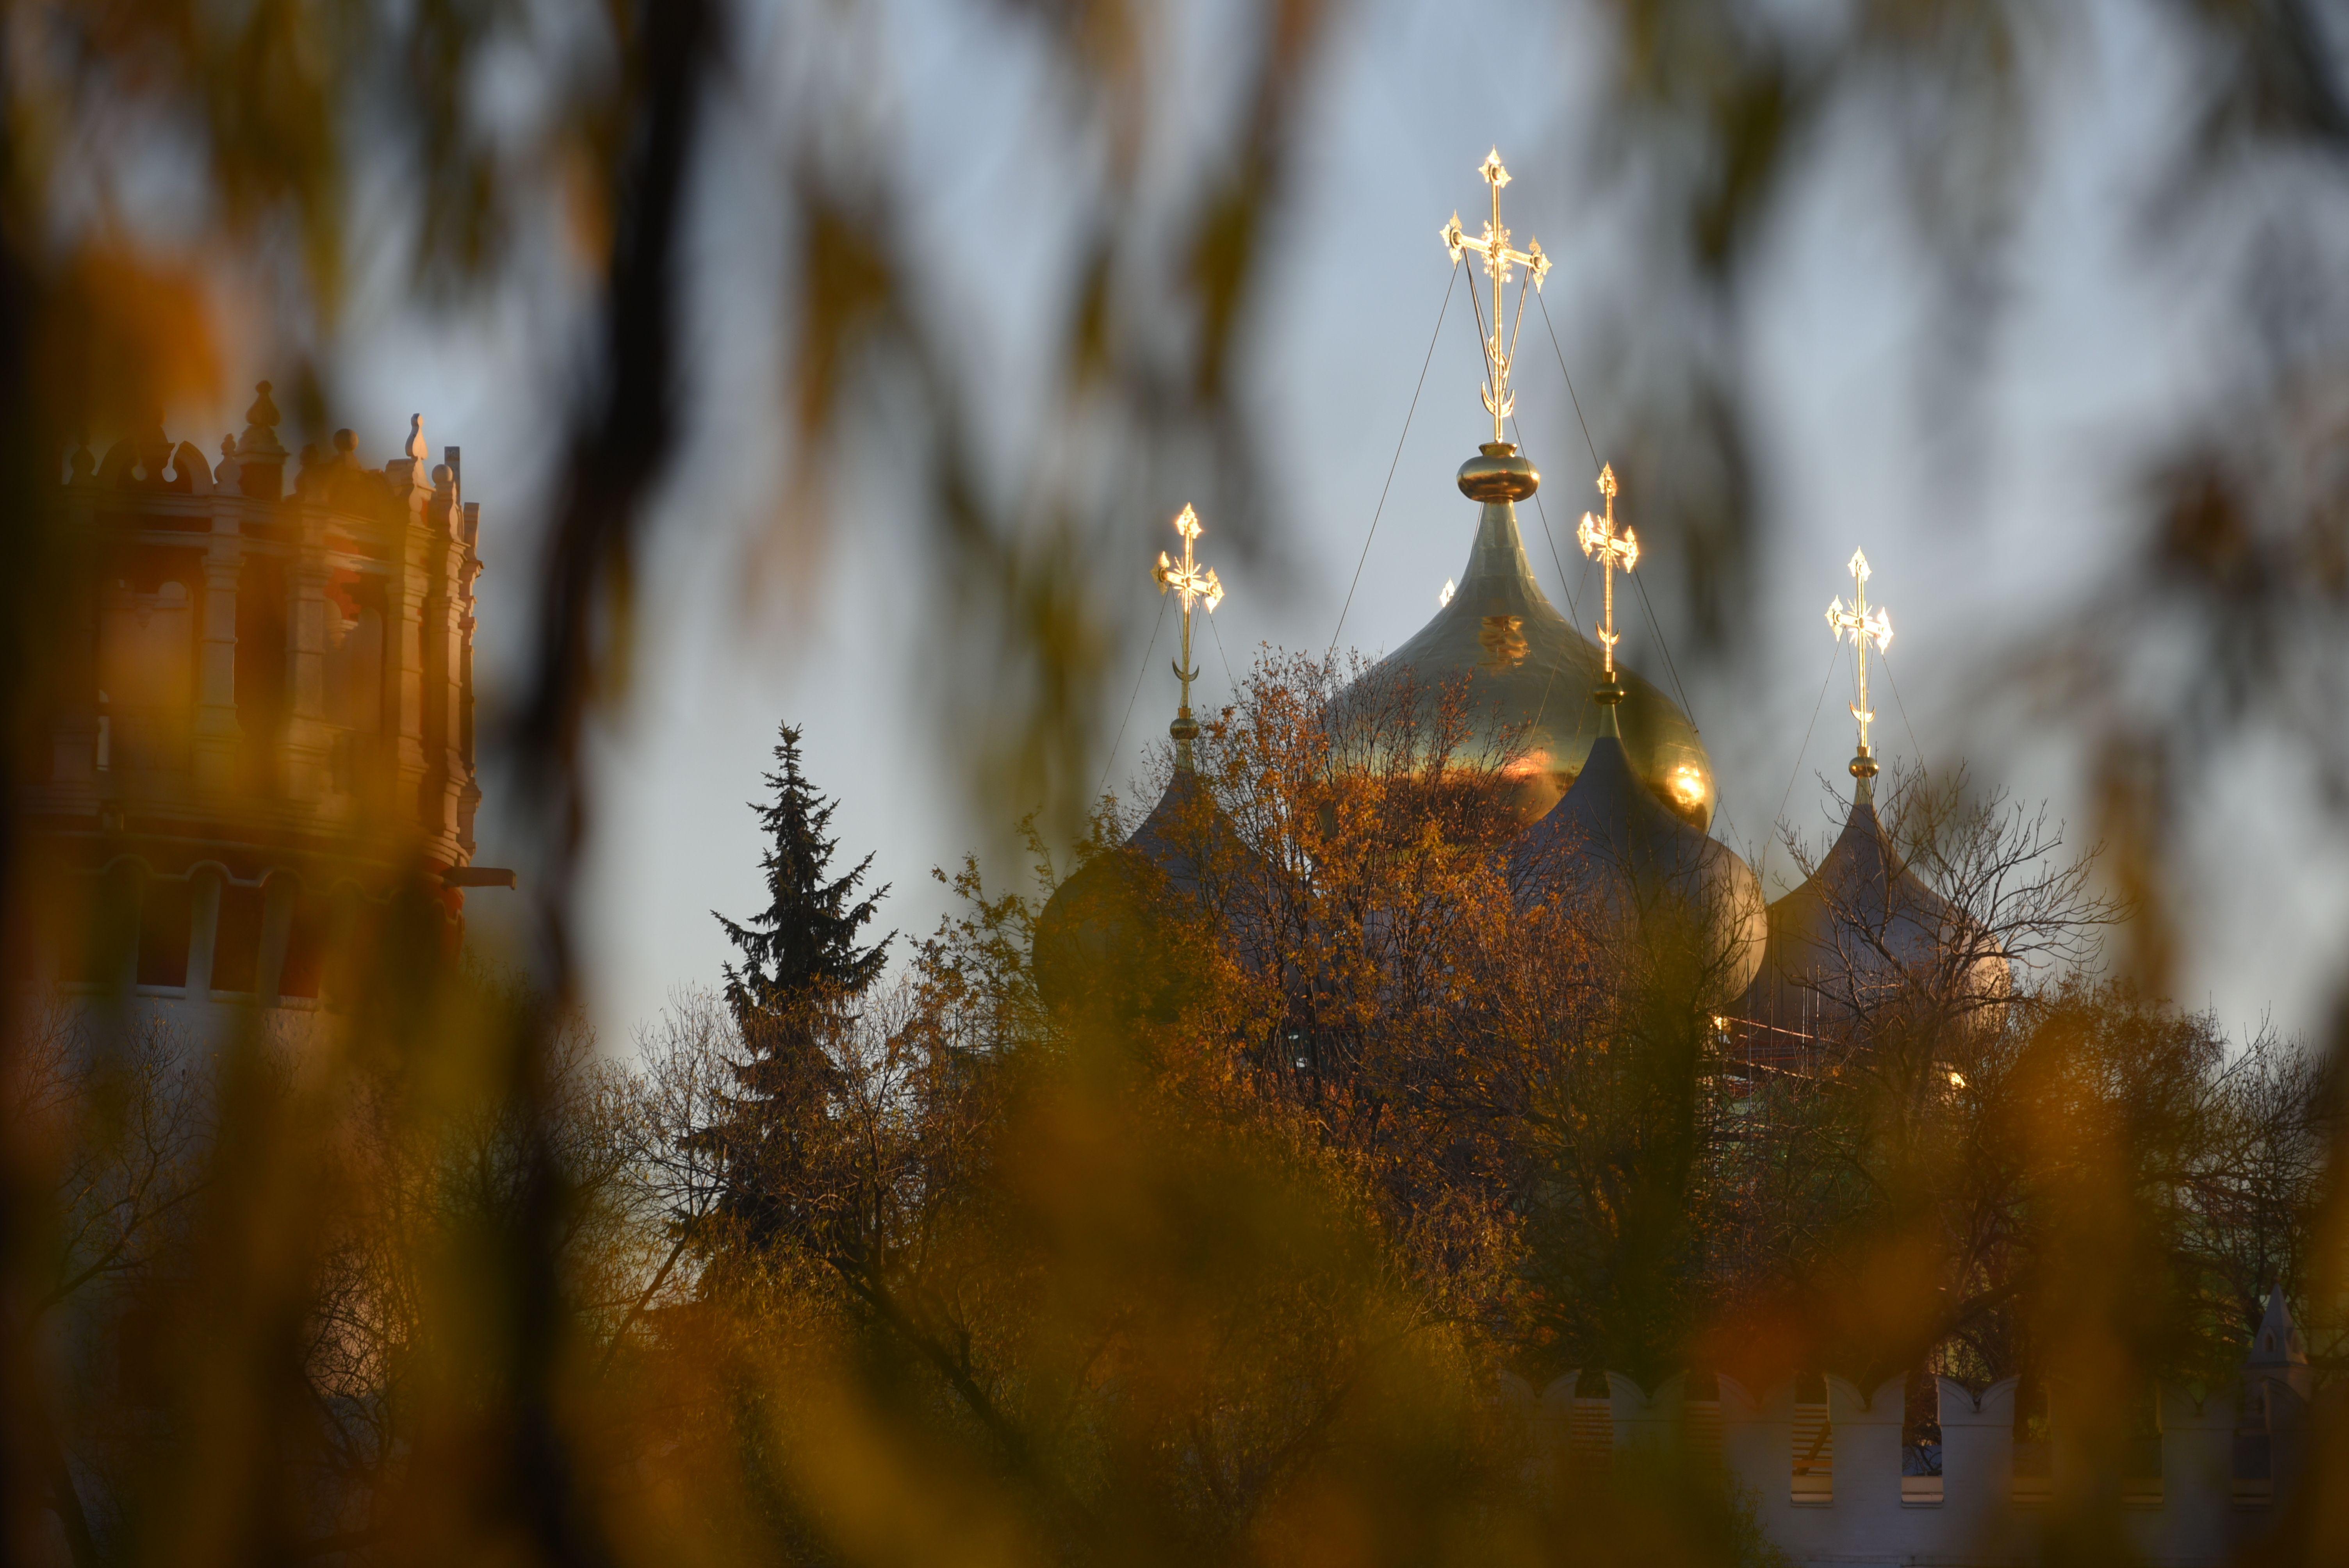 Москвичам пообещали минусовую температуру в ночь на пятницу